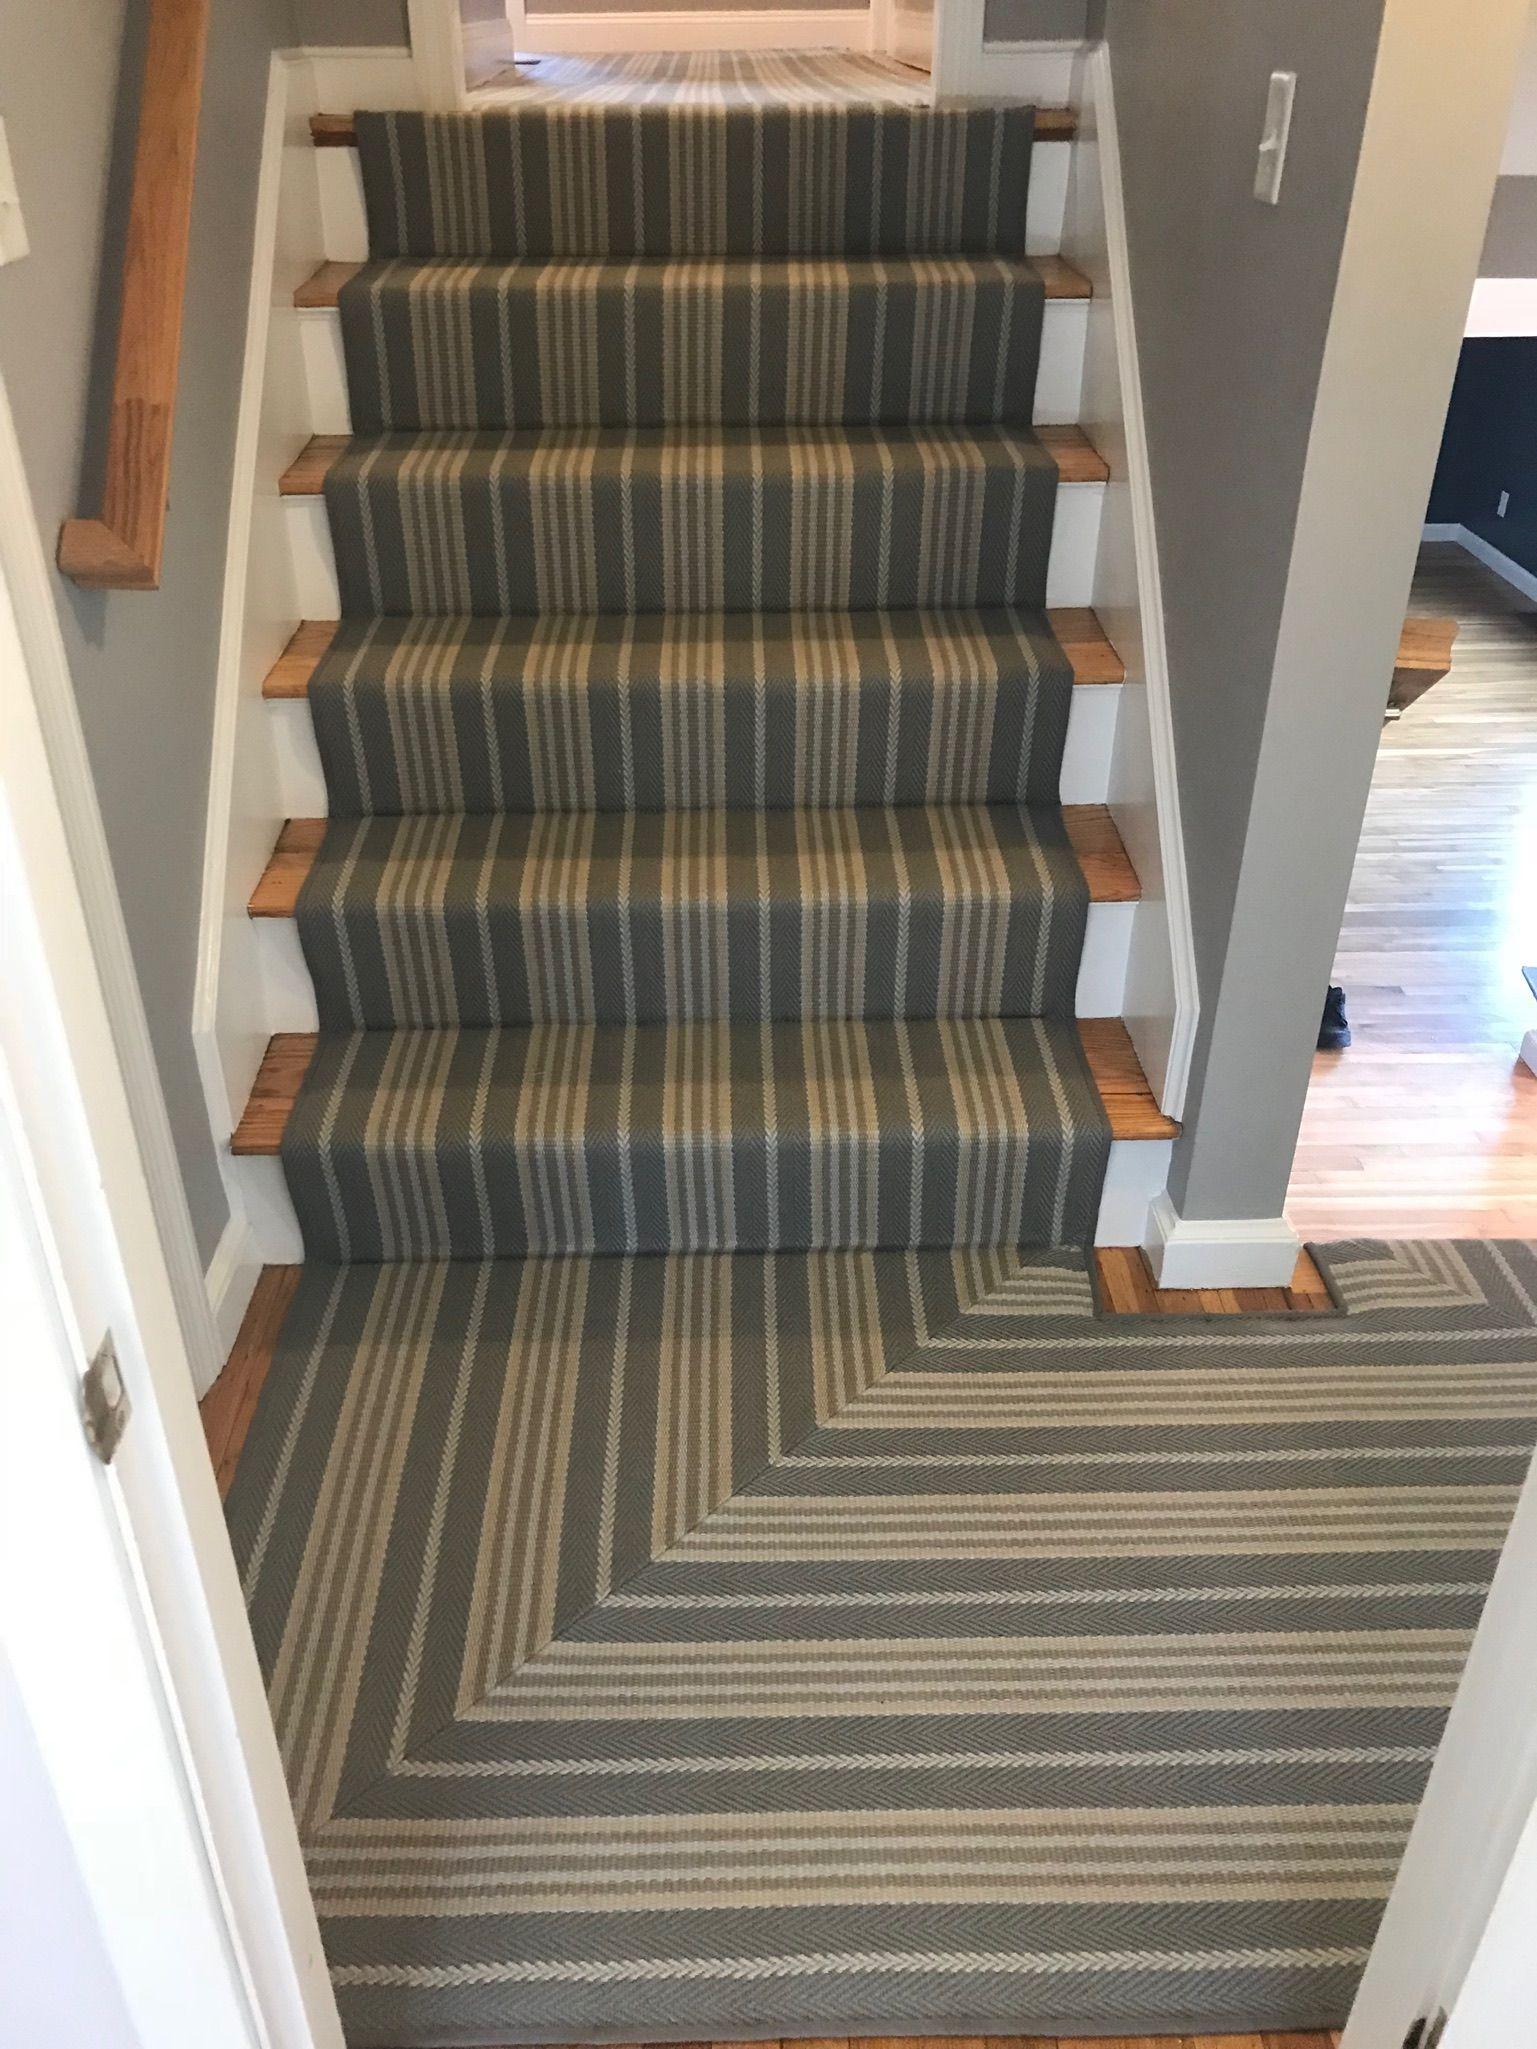 Prestige Mills Mantra Clarence Stripe Blue Ribbon Striped Stair Runner Home Decor Stair Runner